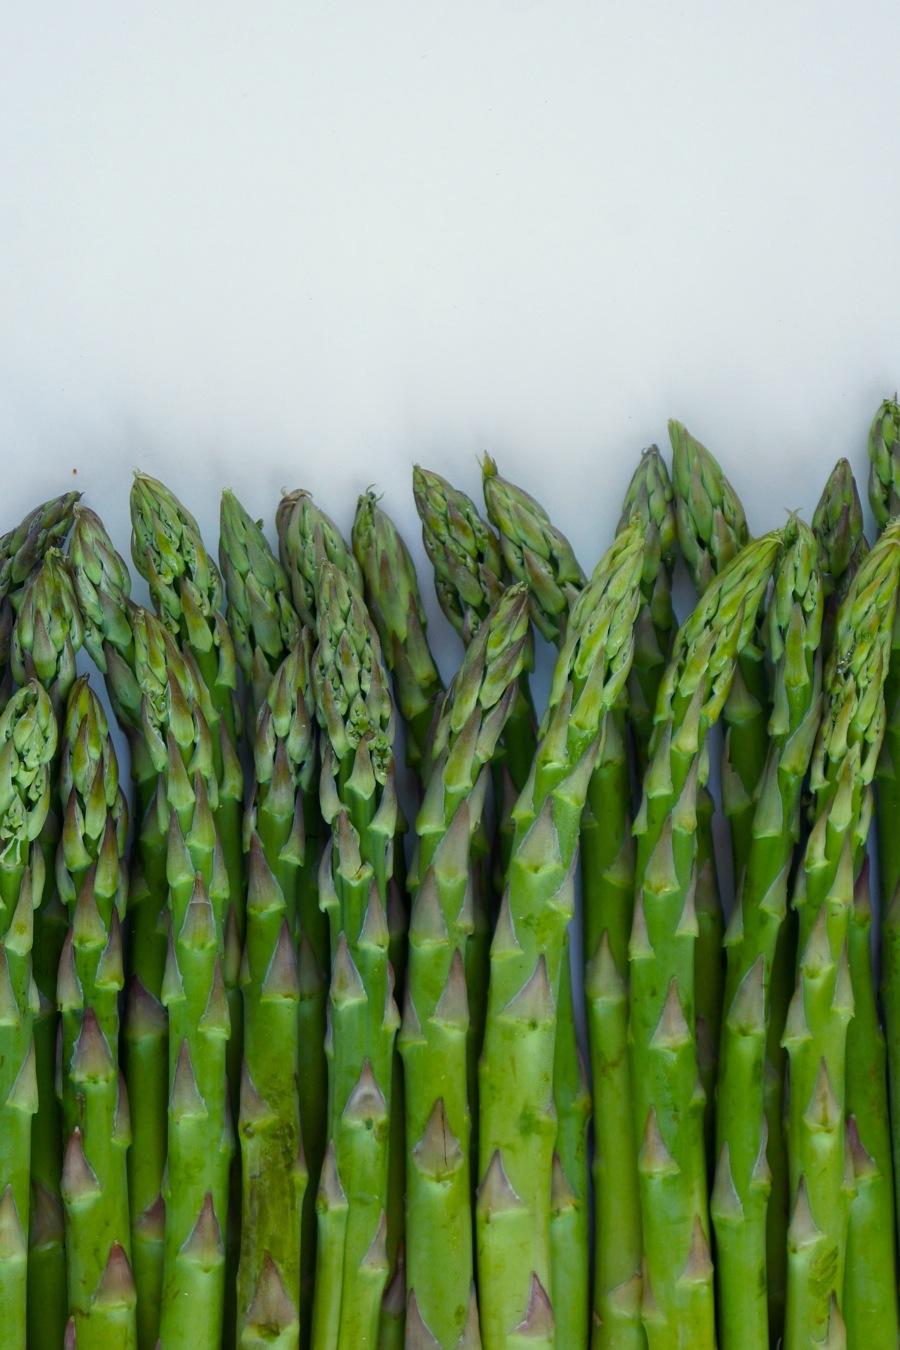 Vibrant, green asparagus